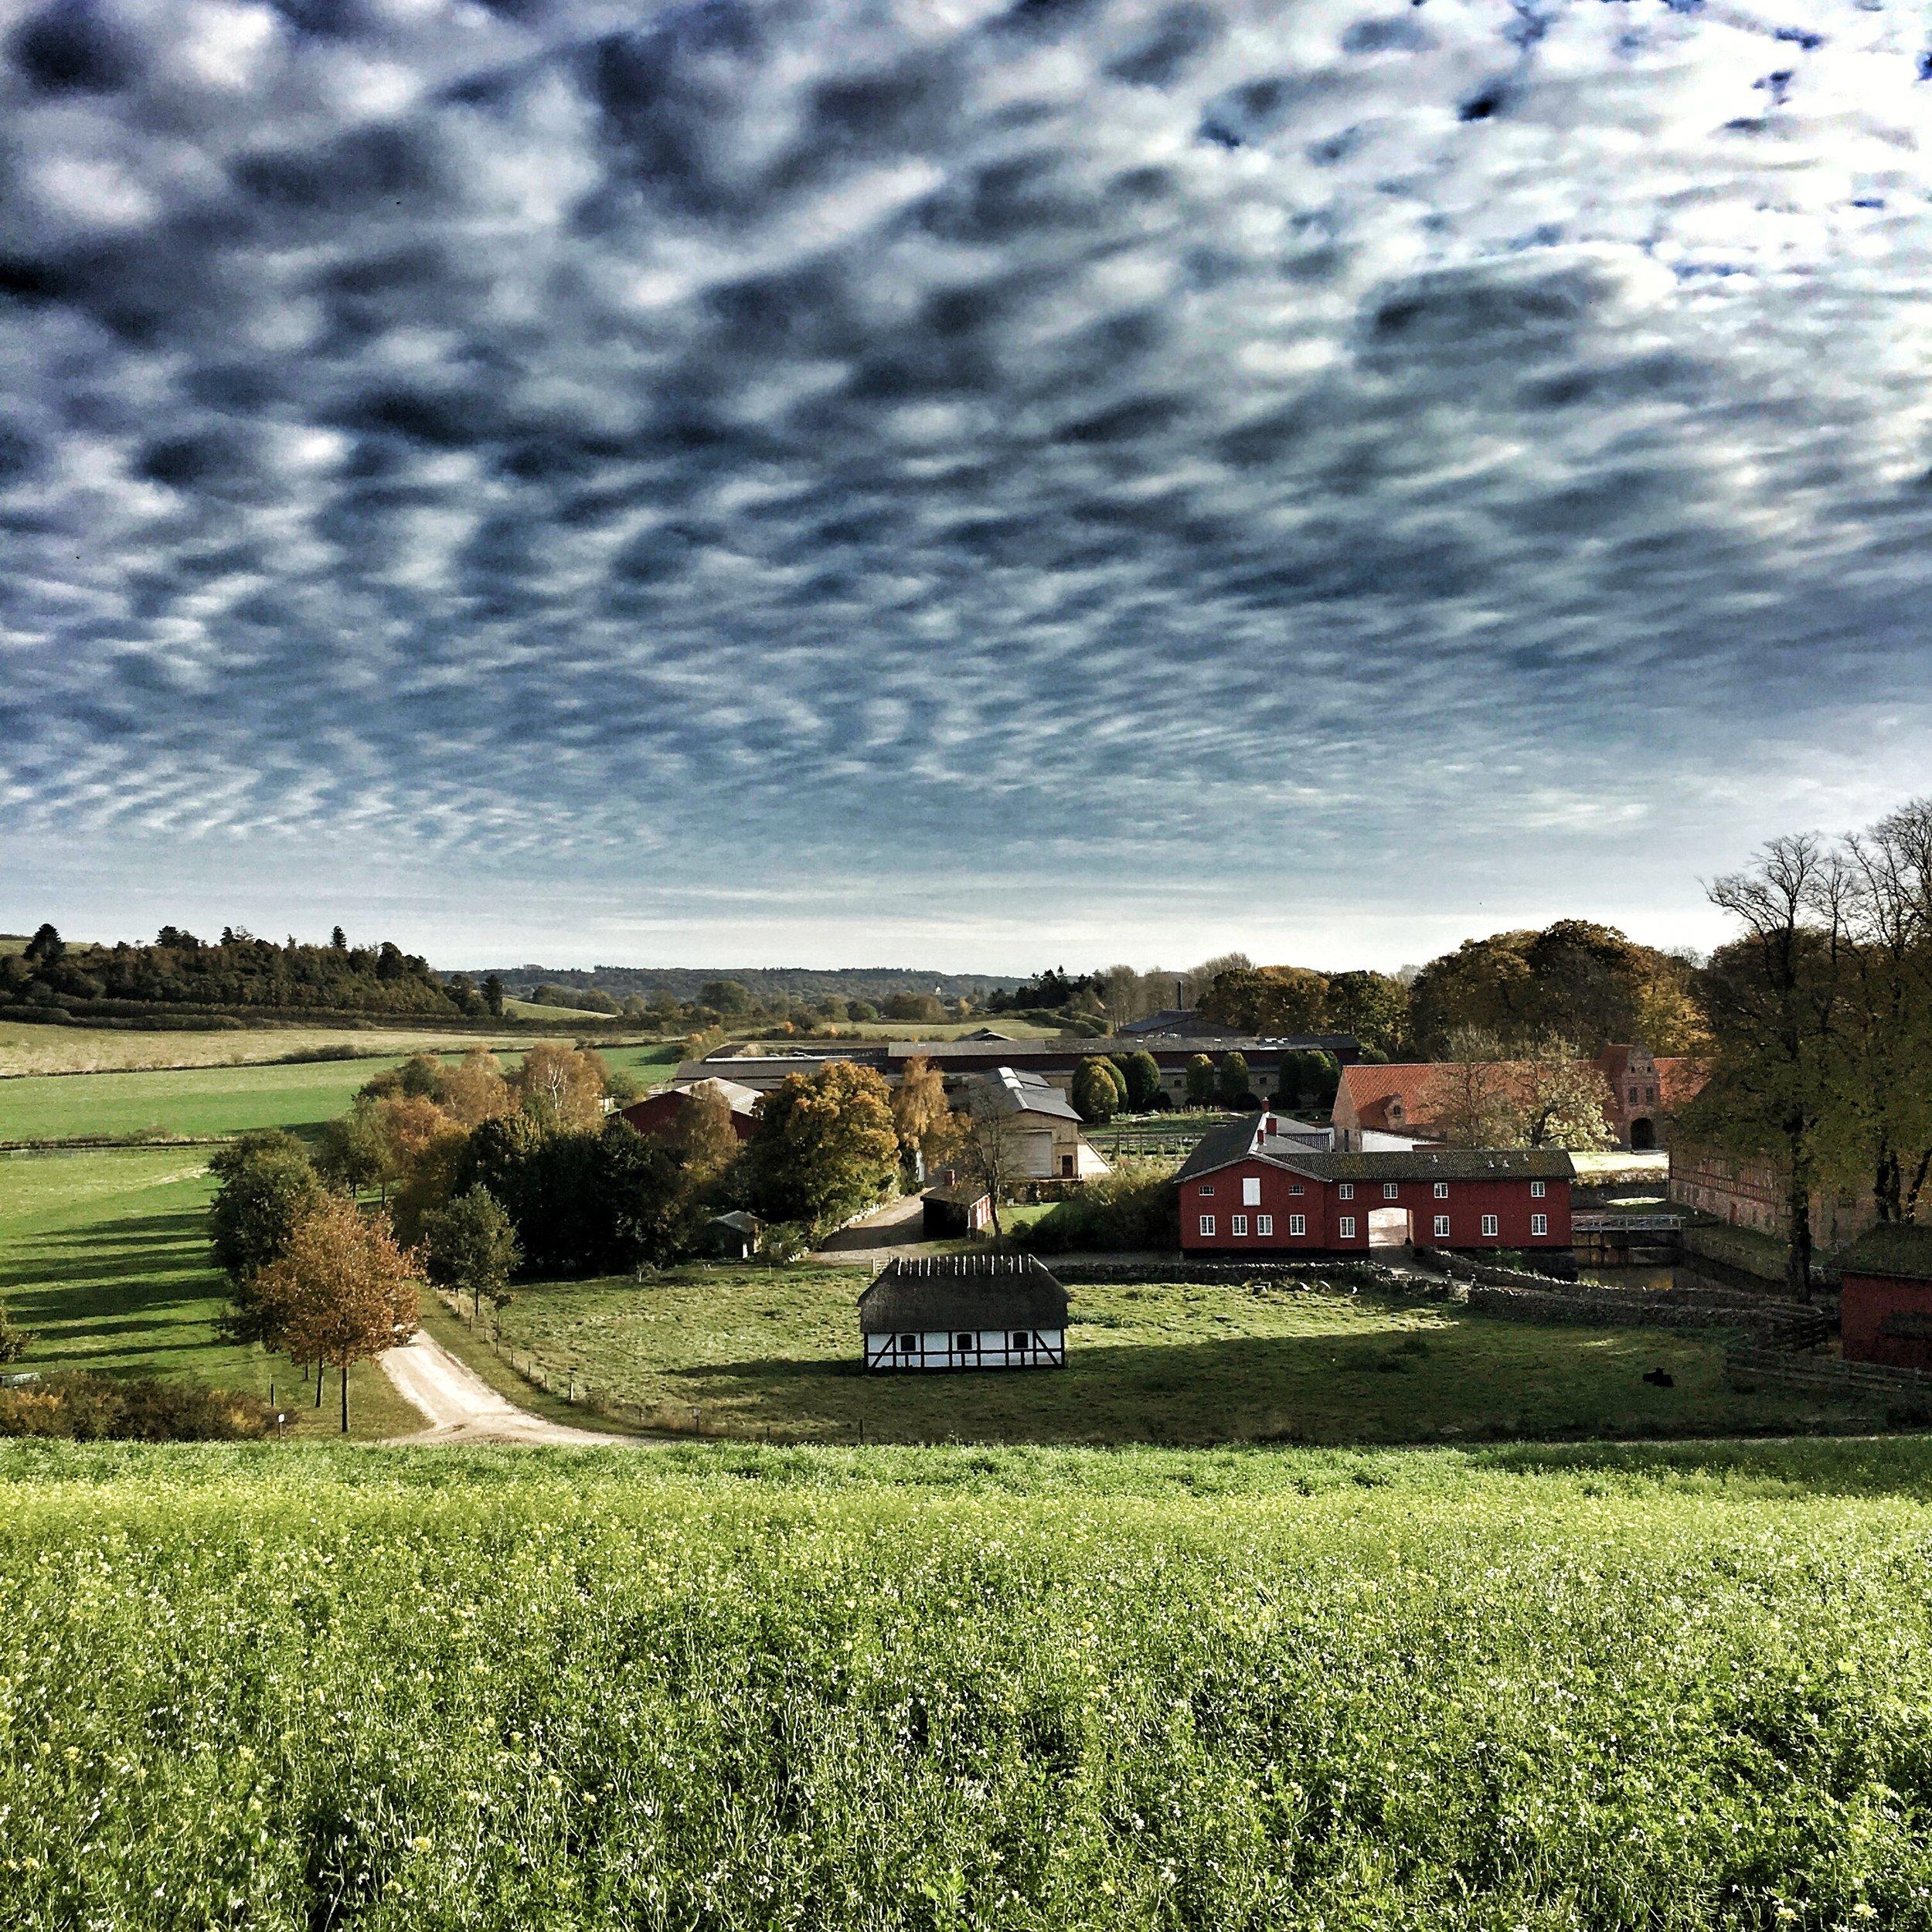 Steensgaard, an organic, self-sustainable farm on the island of Funen, Denmark.